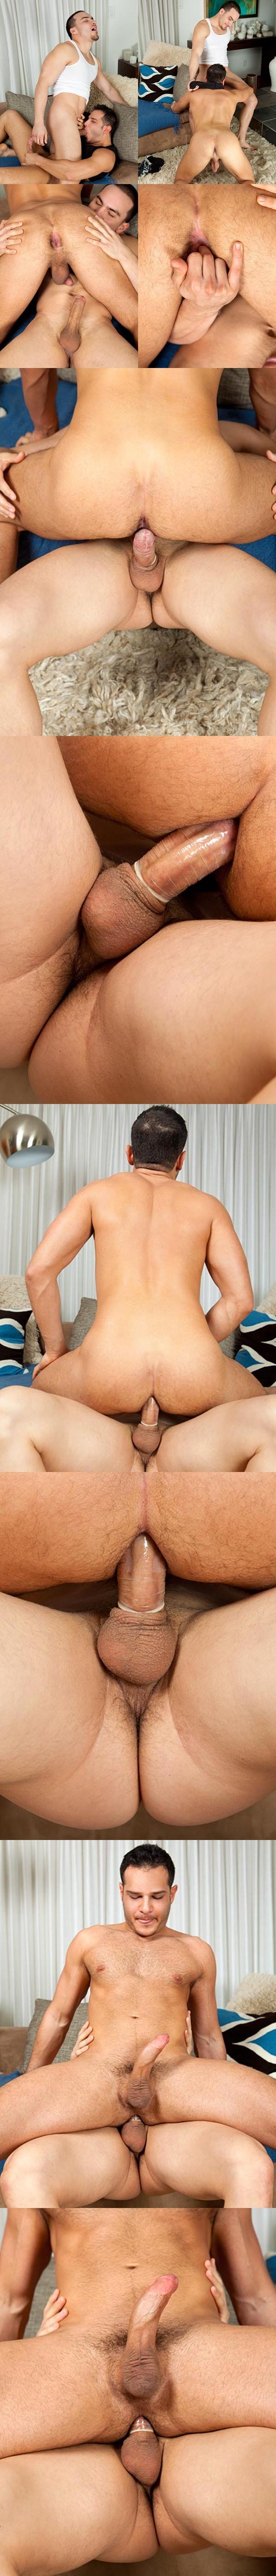 Hung Marcel Cruz fucks hot arab stud Adi Hadad in his virgin ass at Randyblue 01